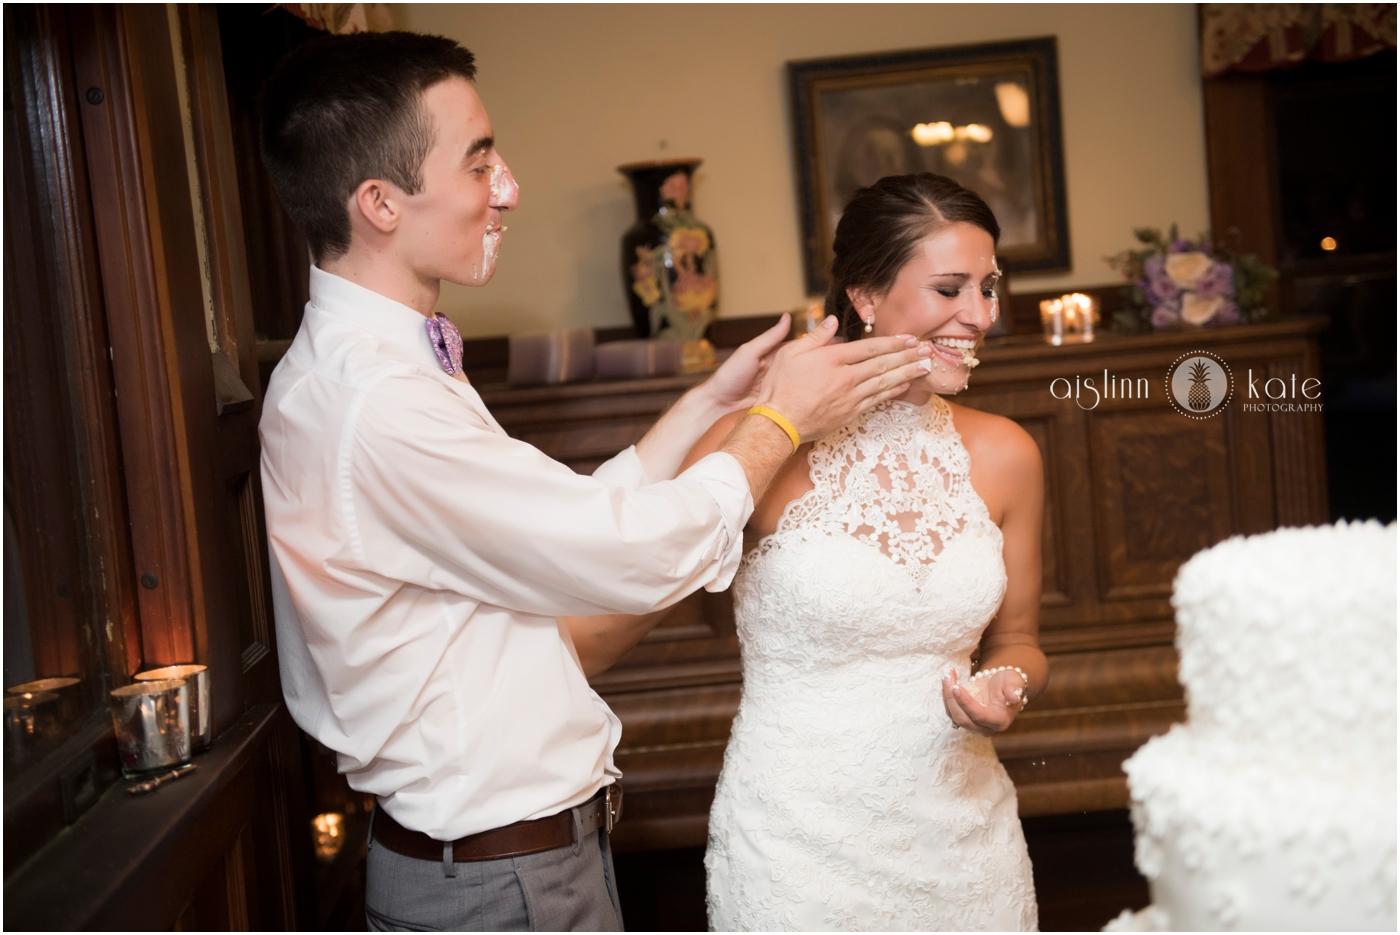 Pensacola-Destin-Wedding-Photographer_8028.jpg